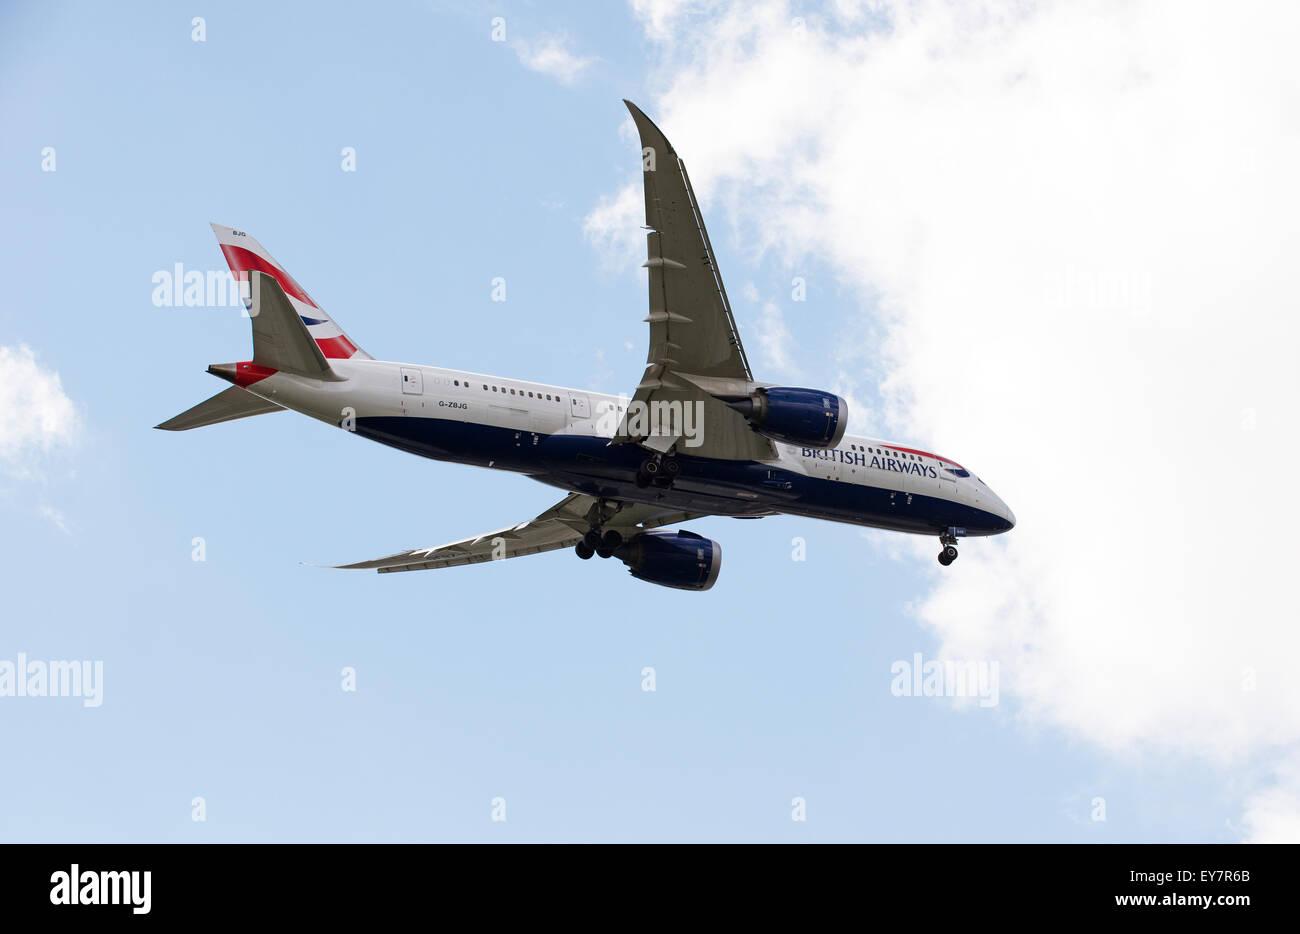 British Airways Boeing 787 passenger jet on final approach to LHR - Stock Image